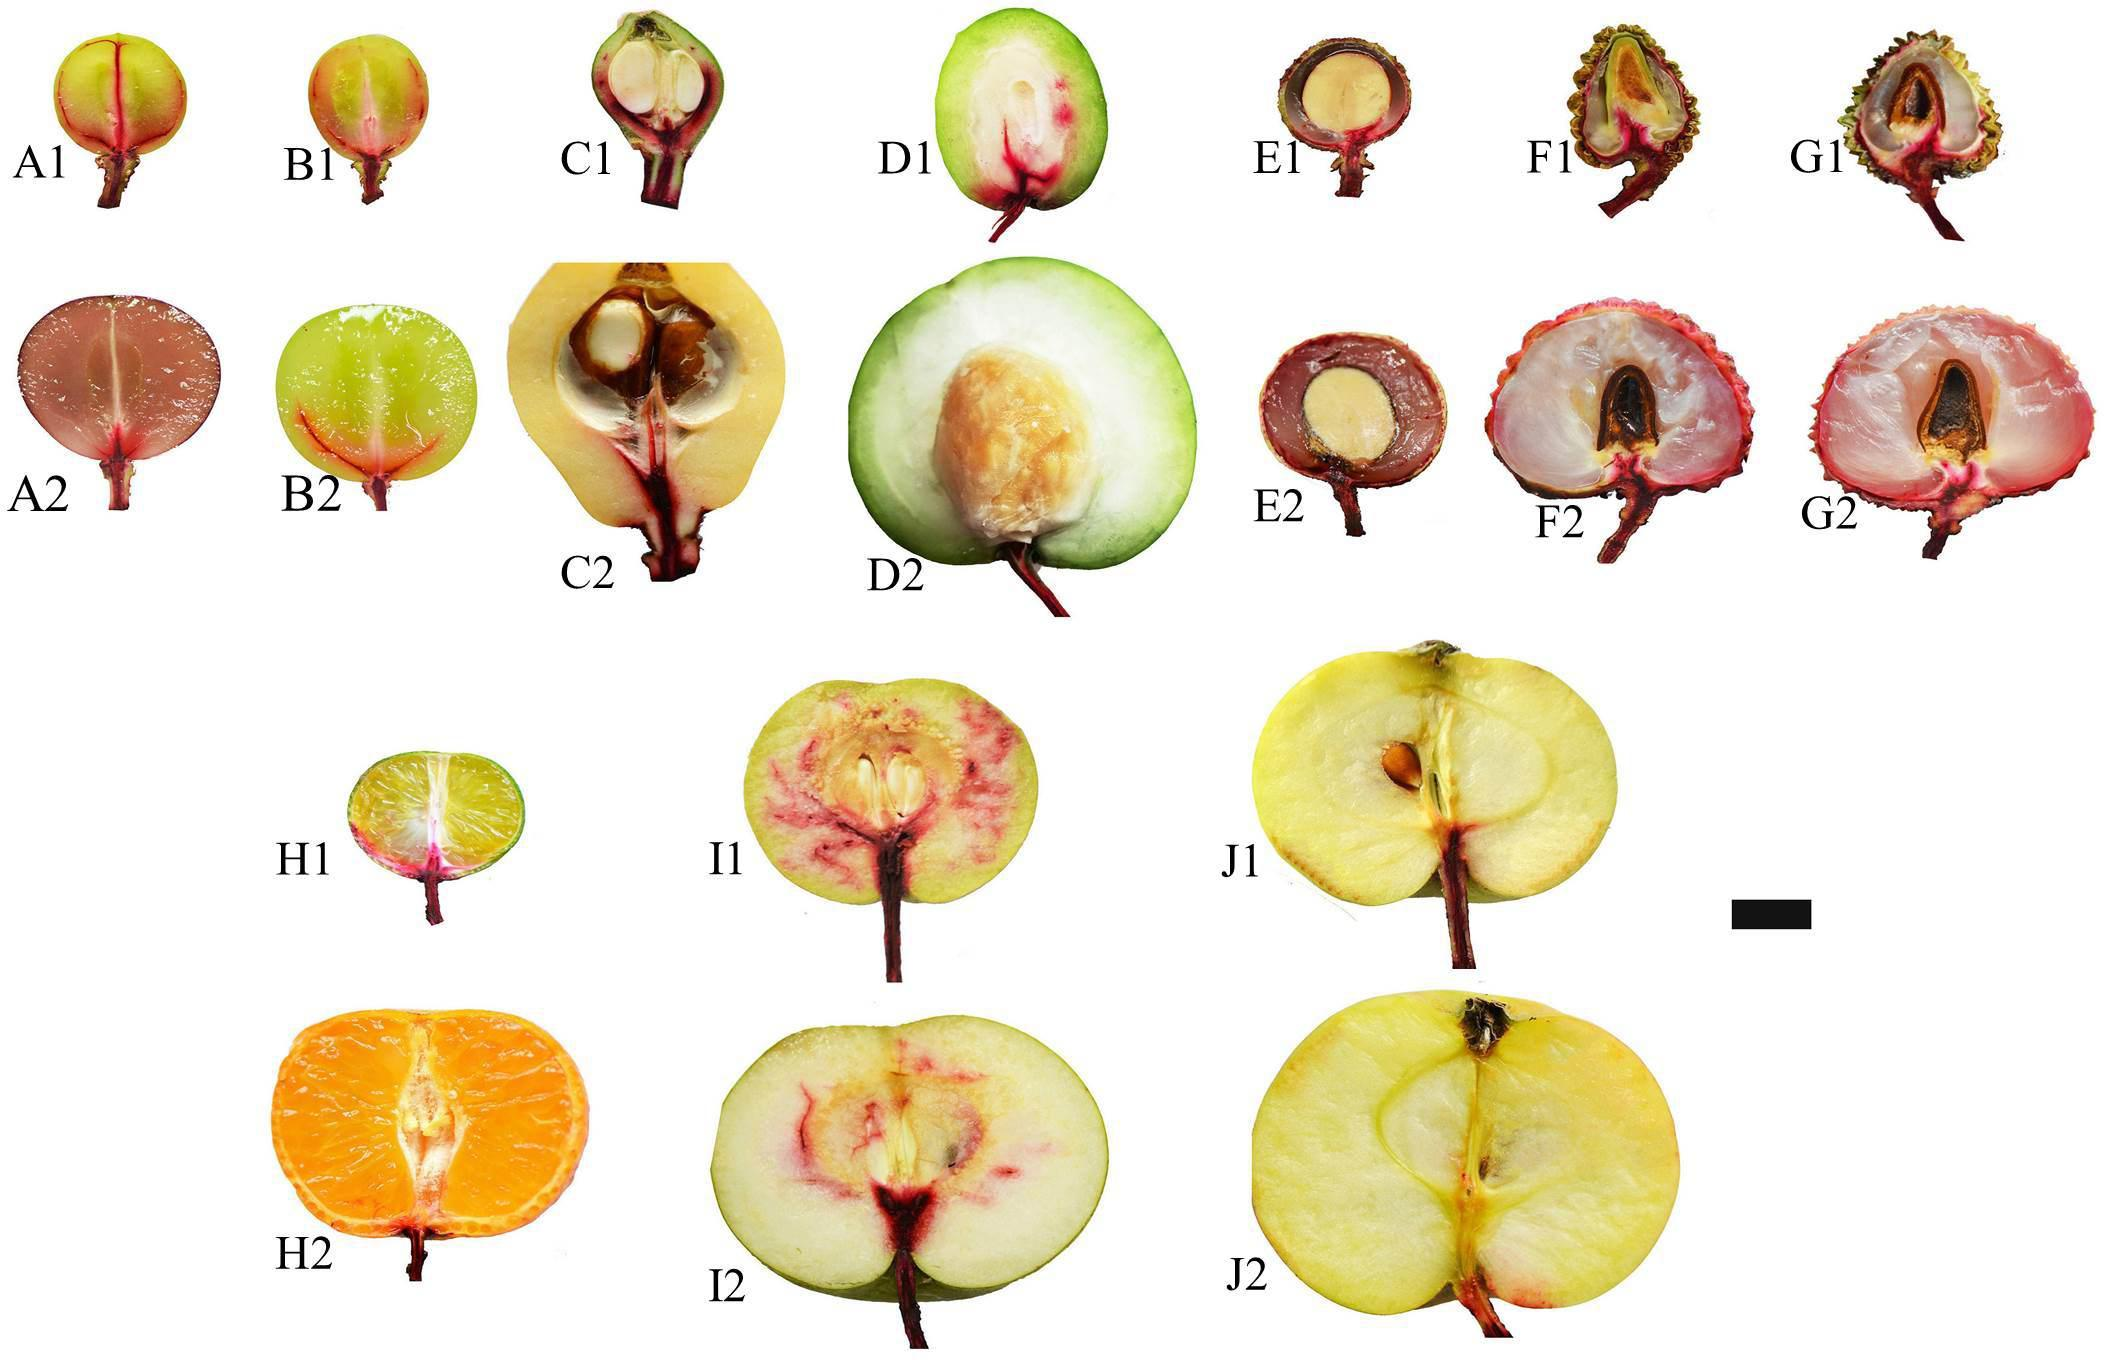 Sa bo che fruit